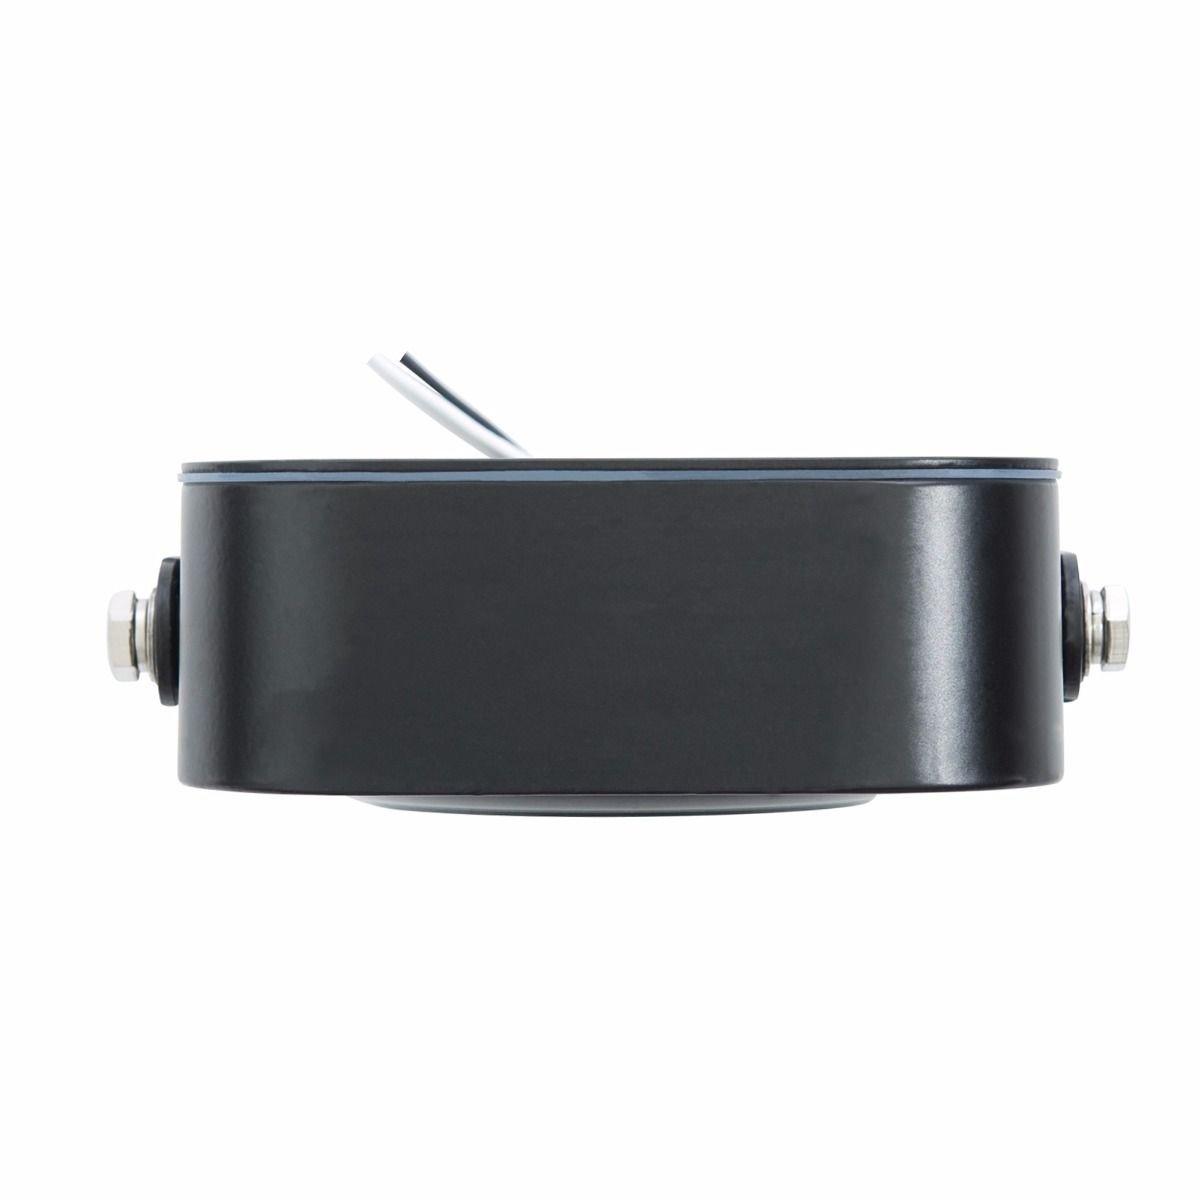 Abrams SLS-100 Slim Siren Speaker, 100W, 5.5'' Height, 2'' Length, 5.9'' Width by Abrams (Image #4)